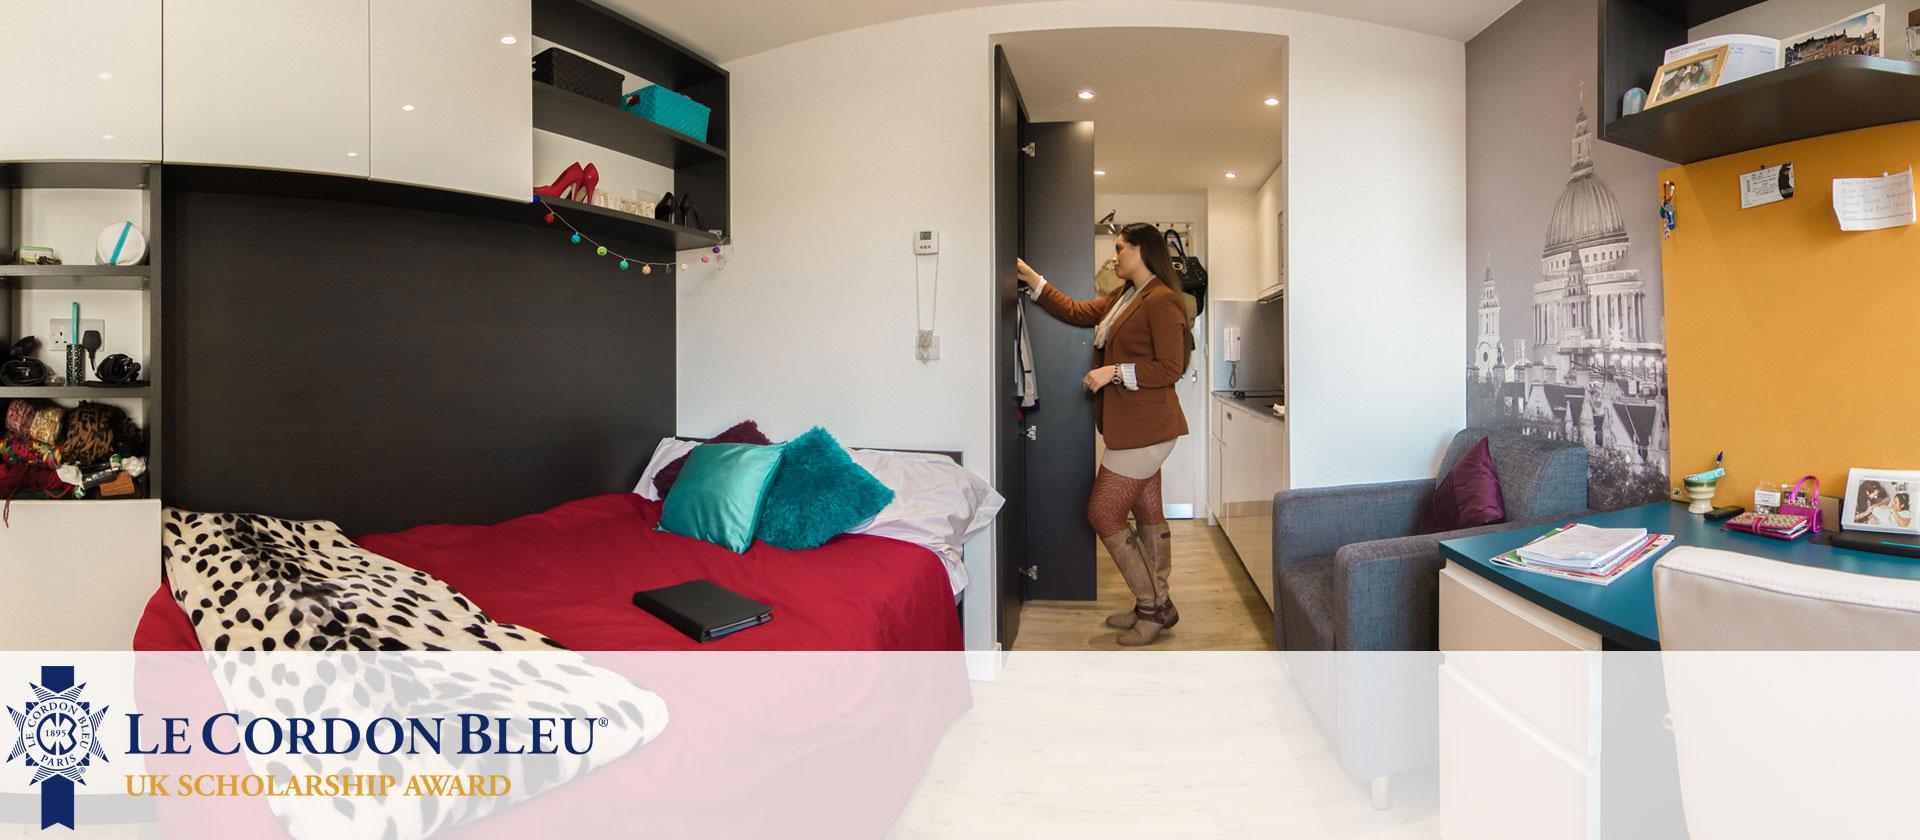 urbanest, the accommodation partner for the uk scholarship award 2016